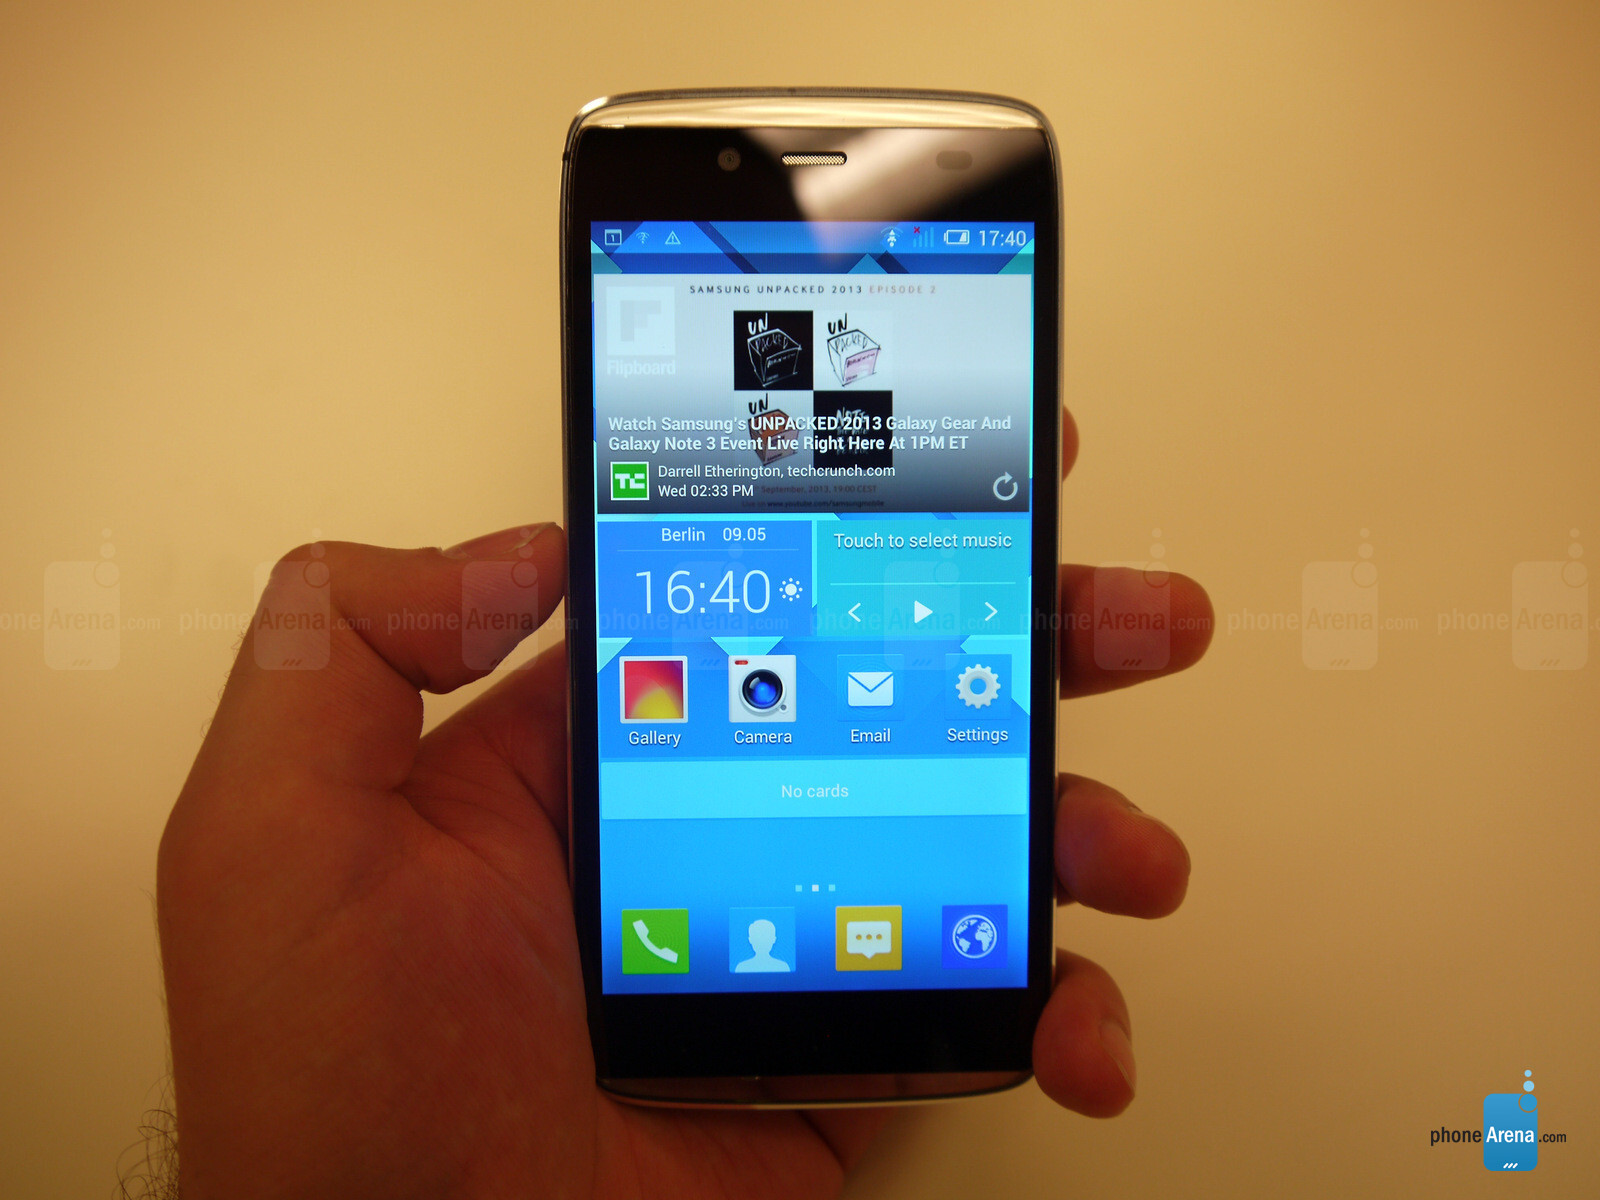 Как сделать скриншот экрана смартфона Alcatel One Touch? 3